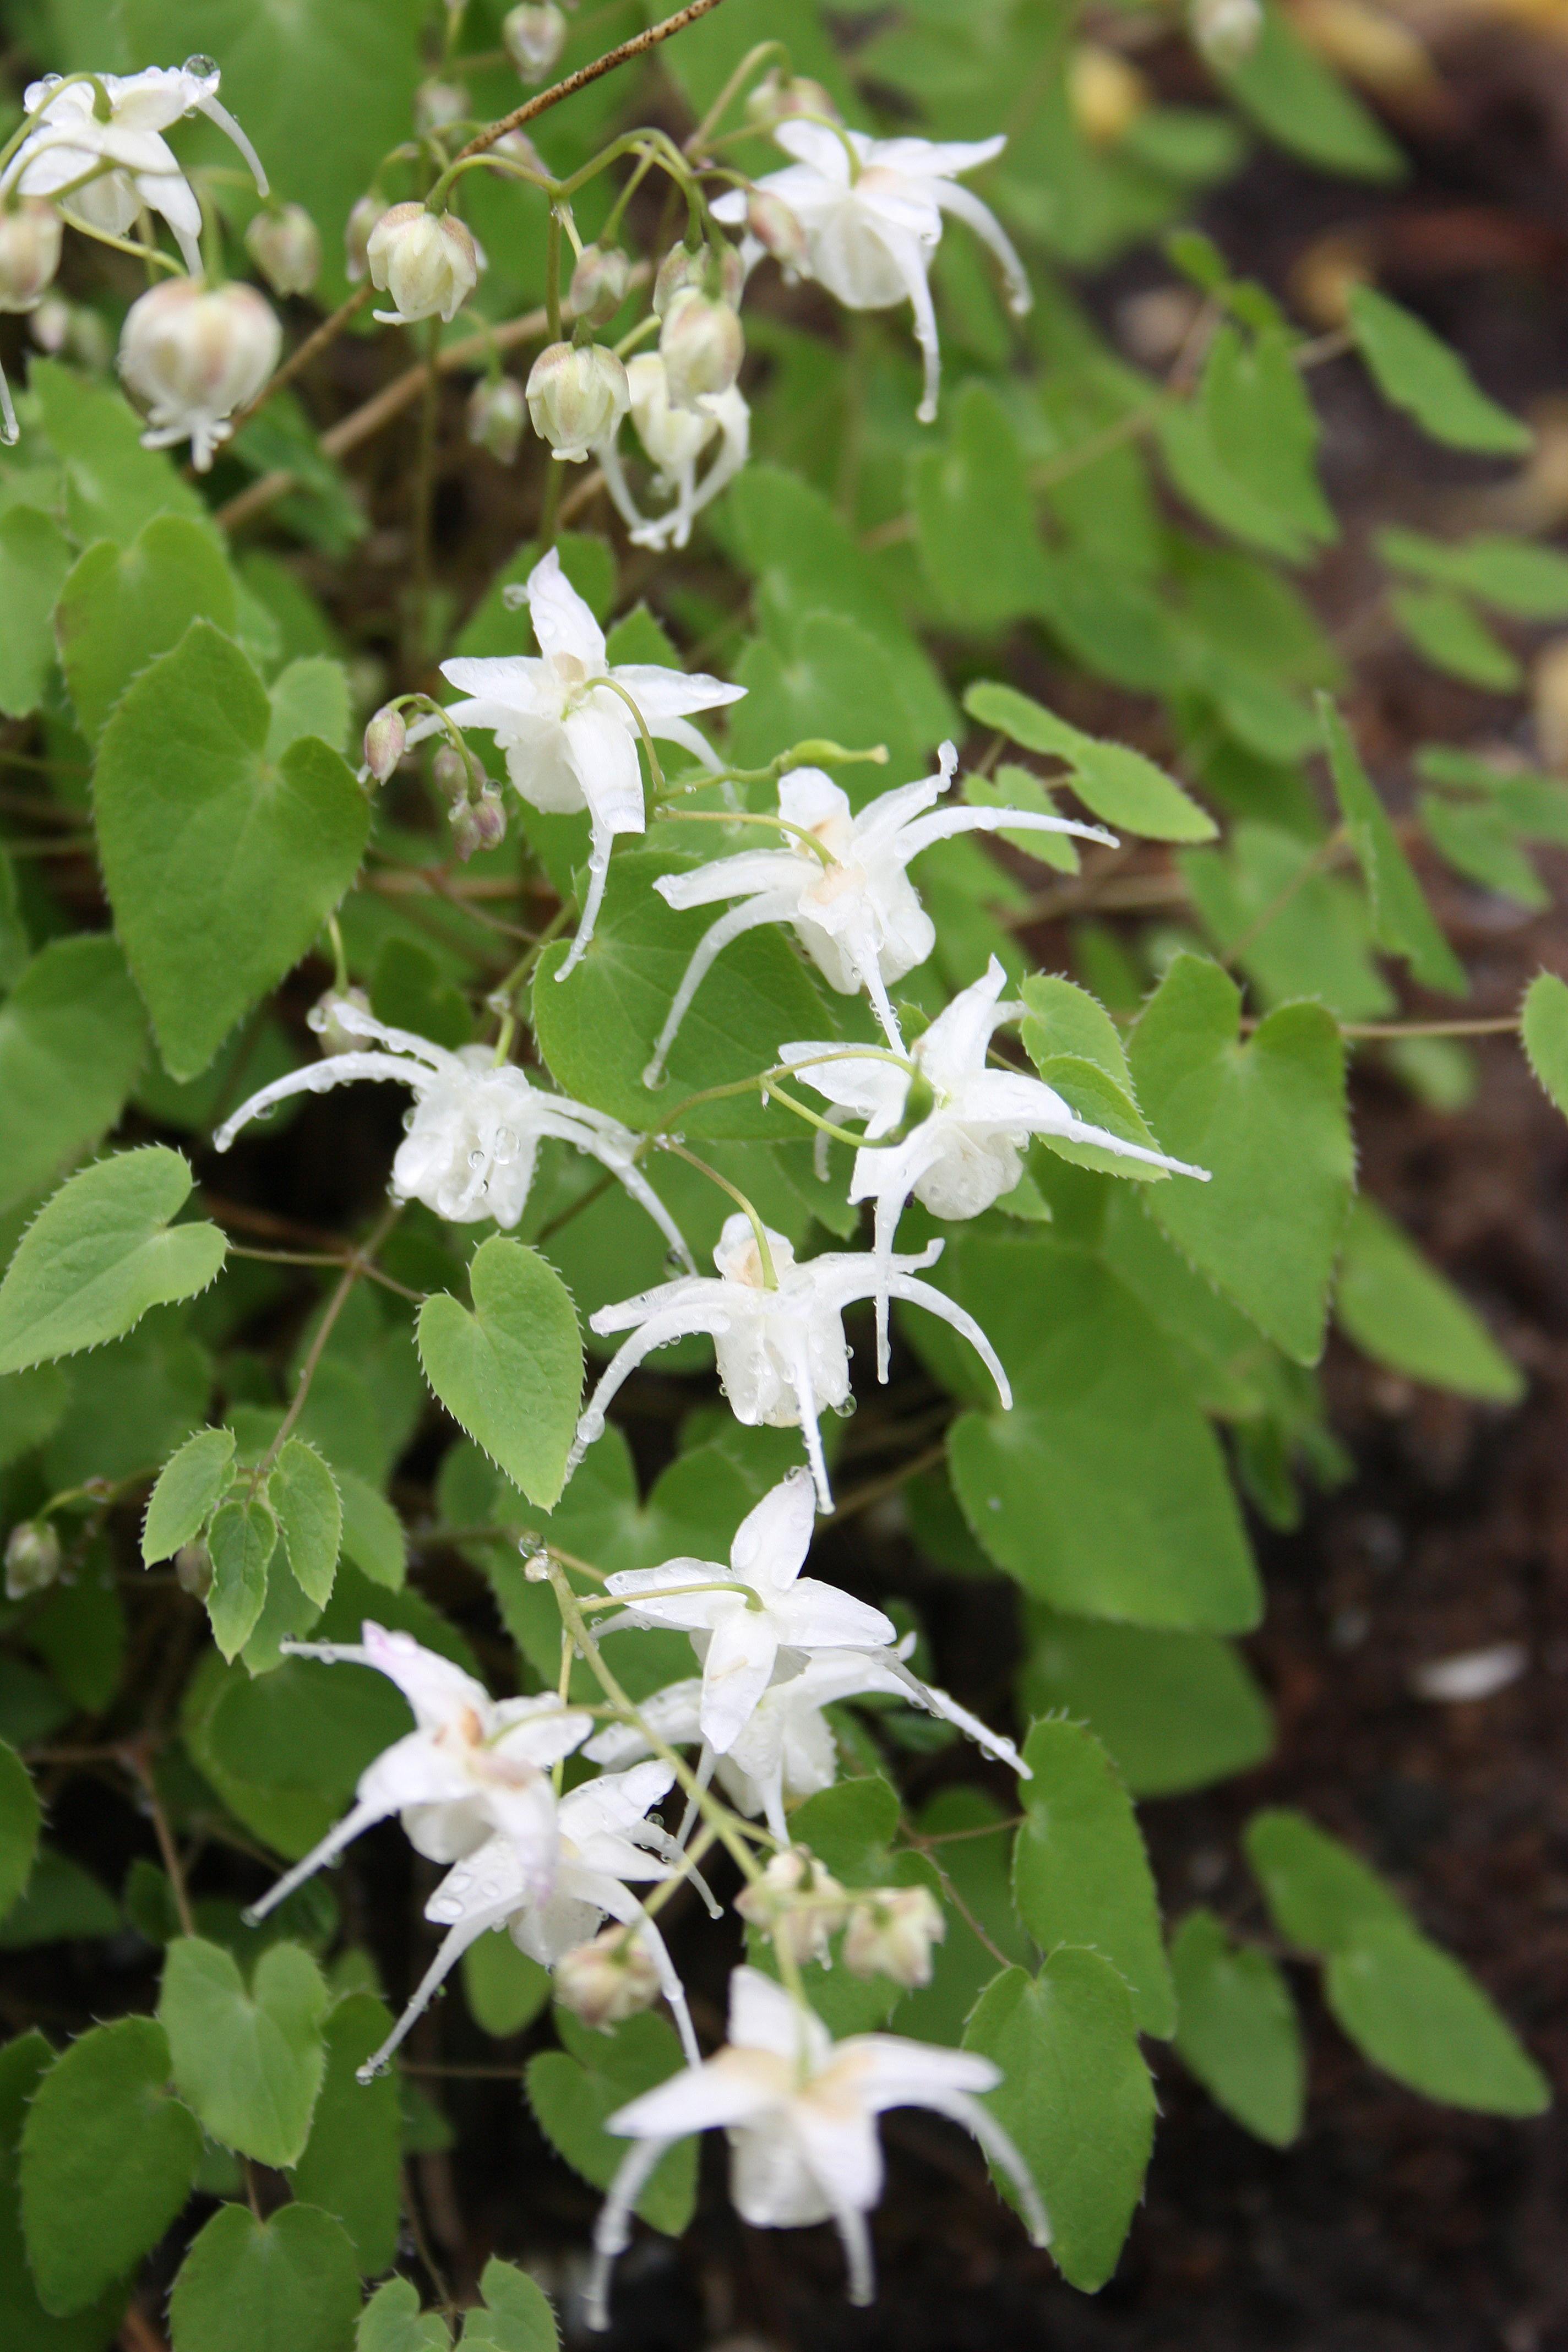 Epimedium x youngianum 'Liliputian' @ JLBG - a Don Jacobs/Eco Gardens introduction; deciduous